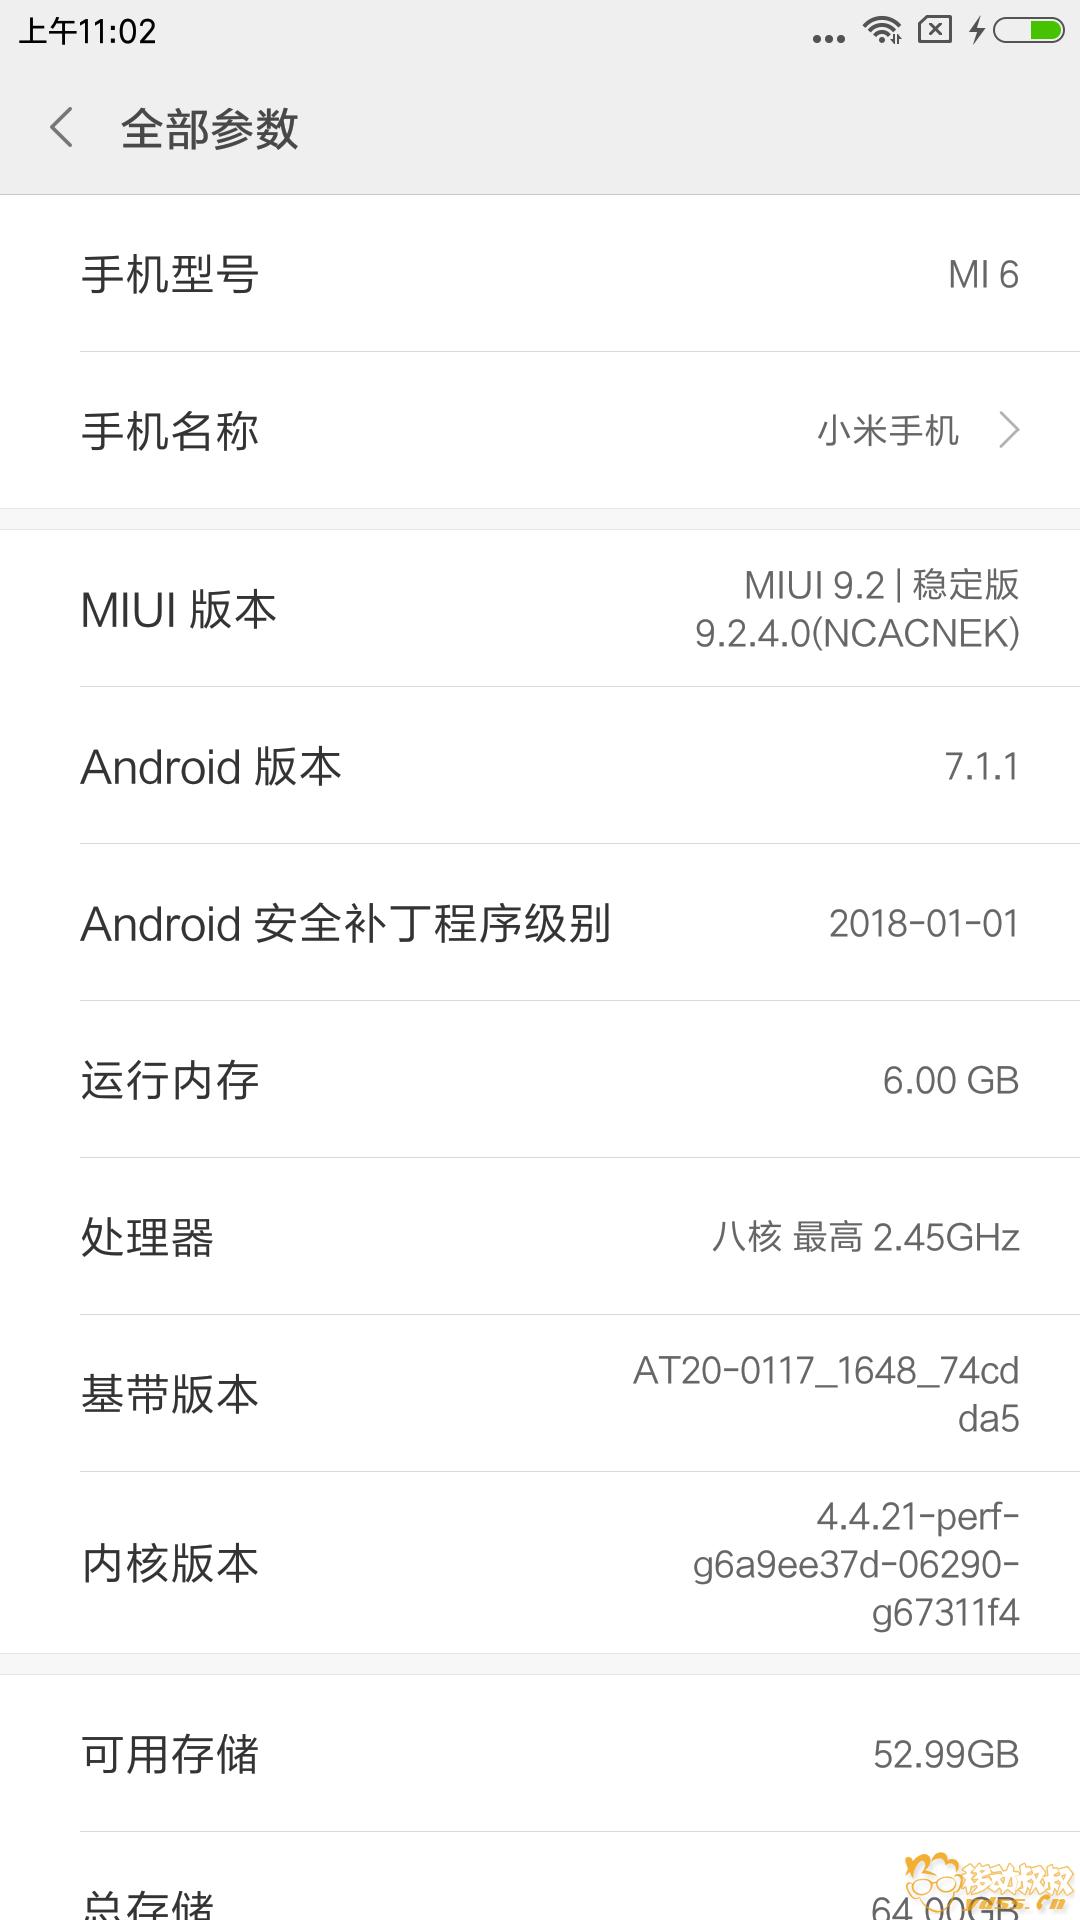 Screenshot_2018-01-31-11-02-53-162_com.android.settings.png